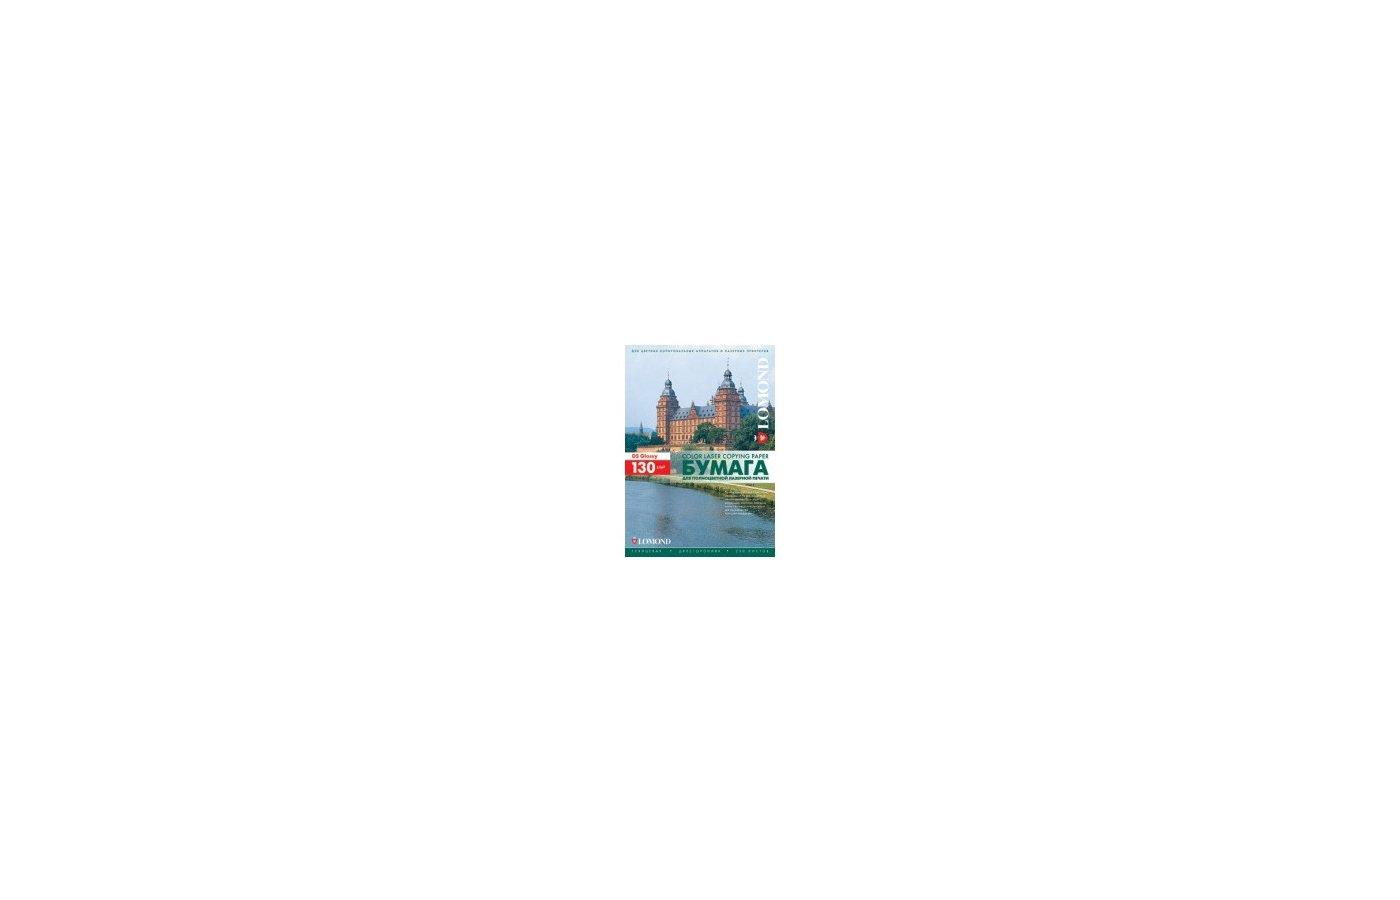 Фотобумага Lomond 0310141 A4/130г/м2/250л./белый глянцевое/глянцевое для лазерной печати